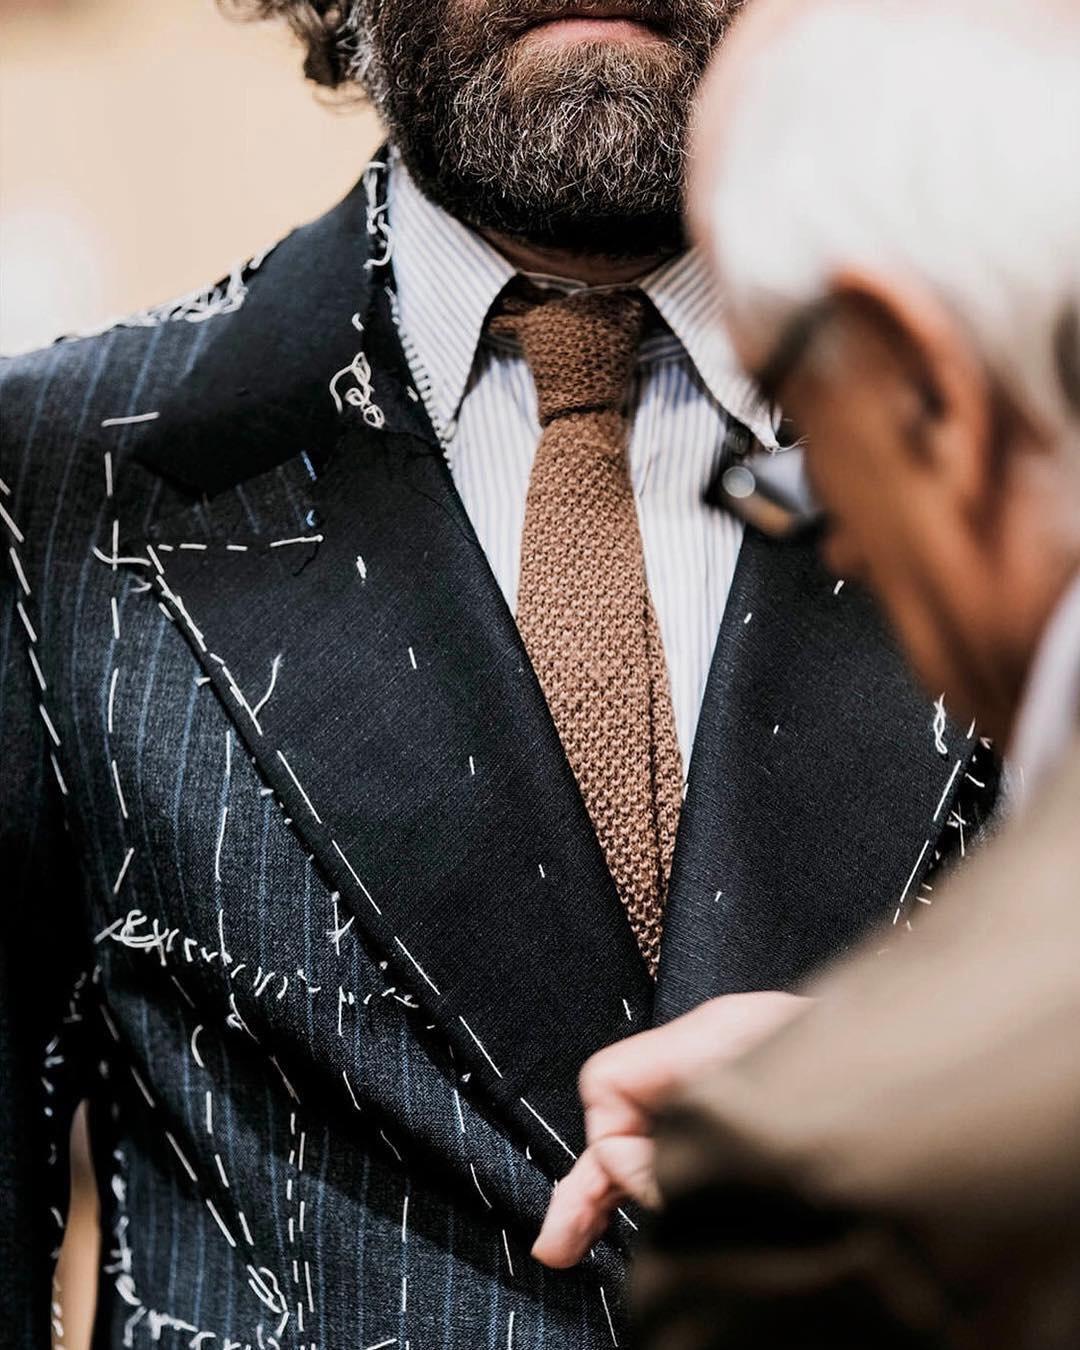 Bespoke suitmaker